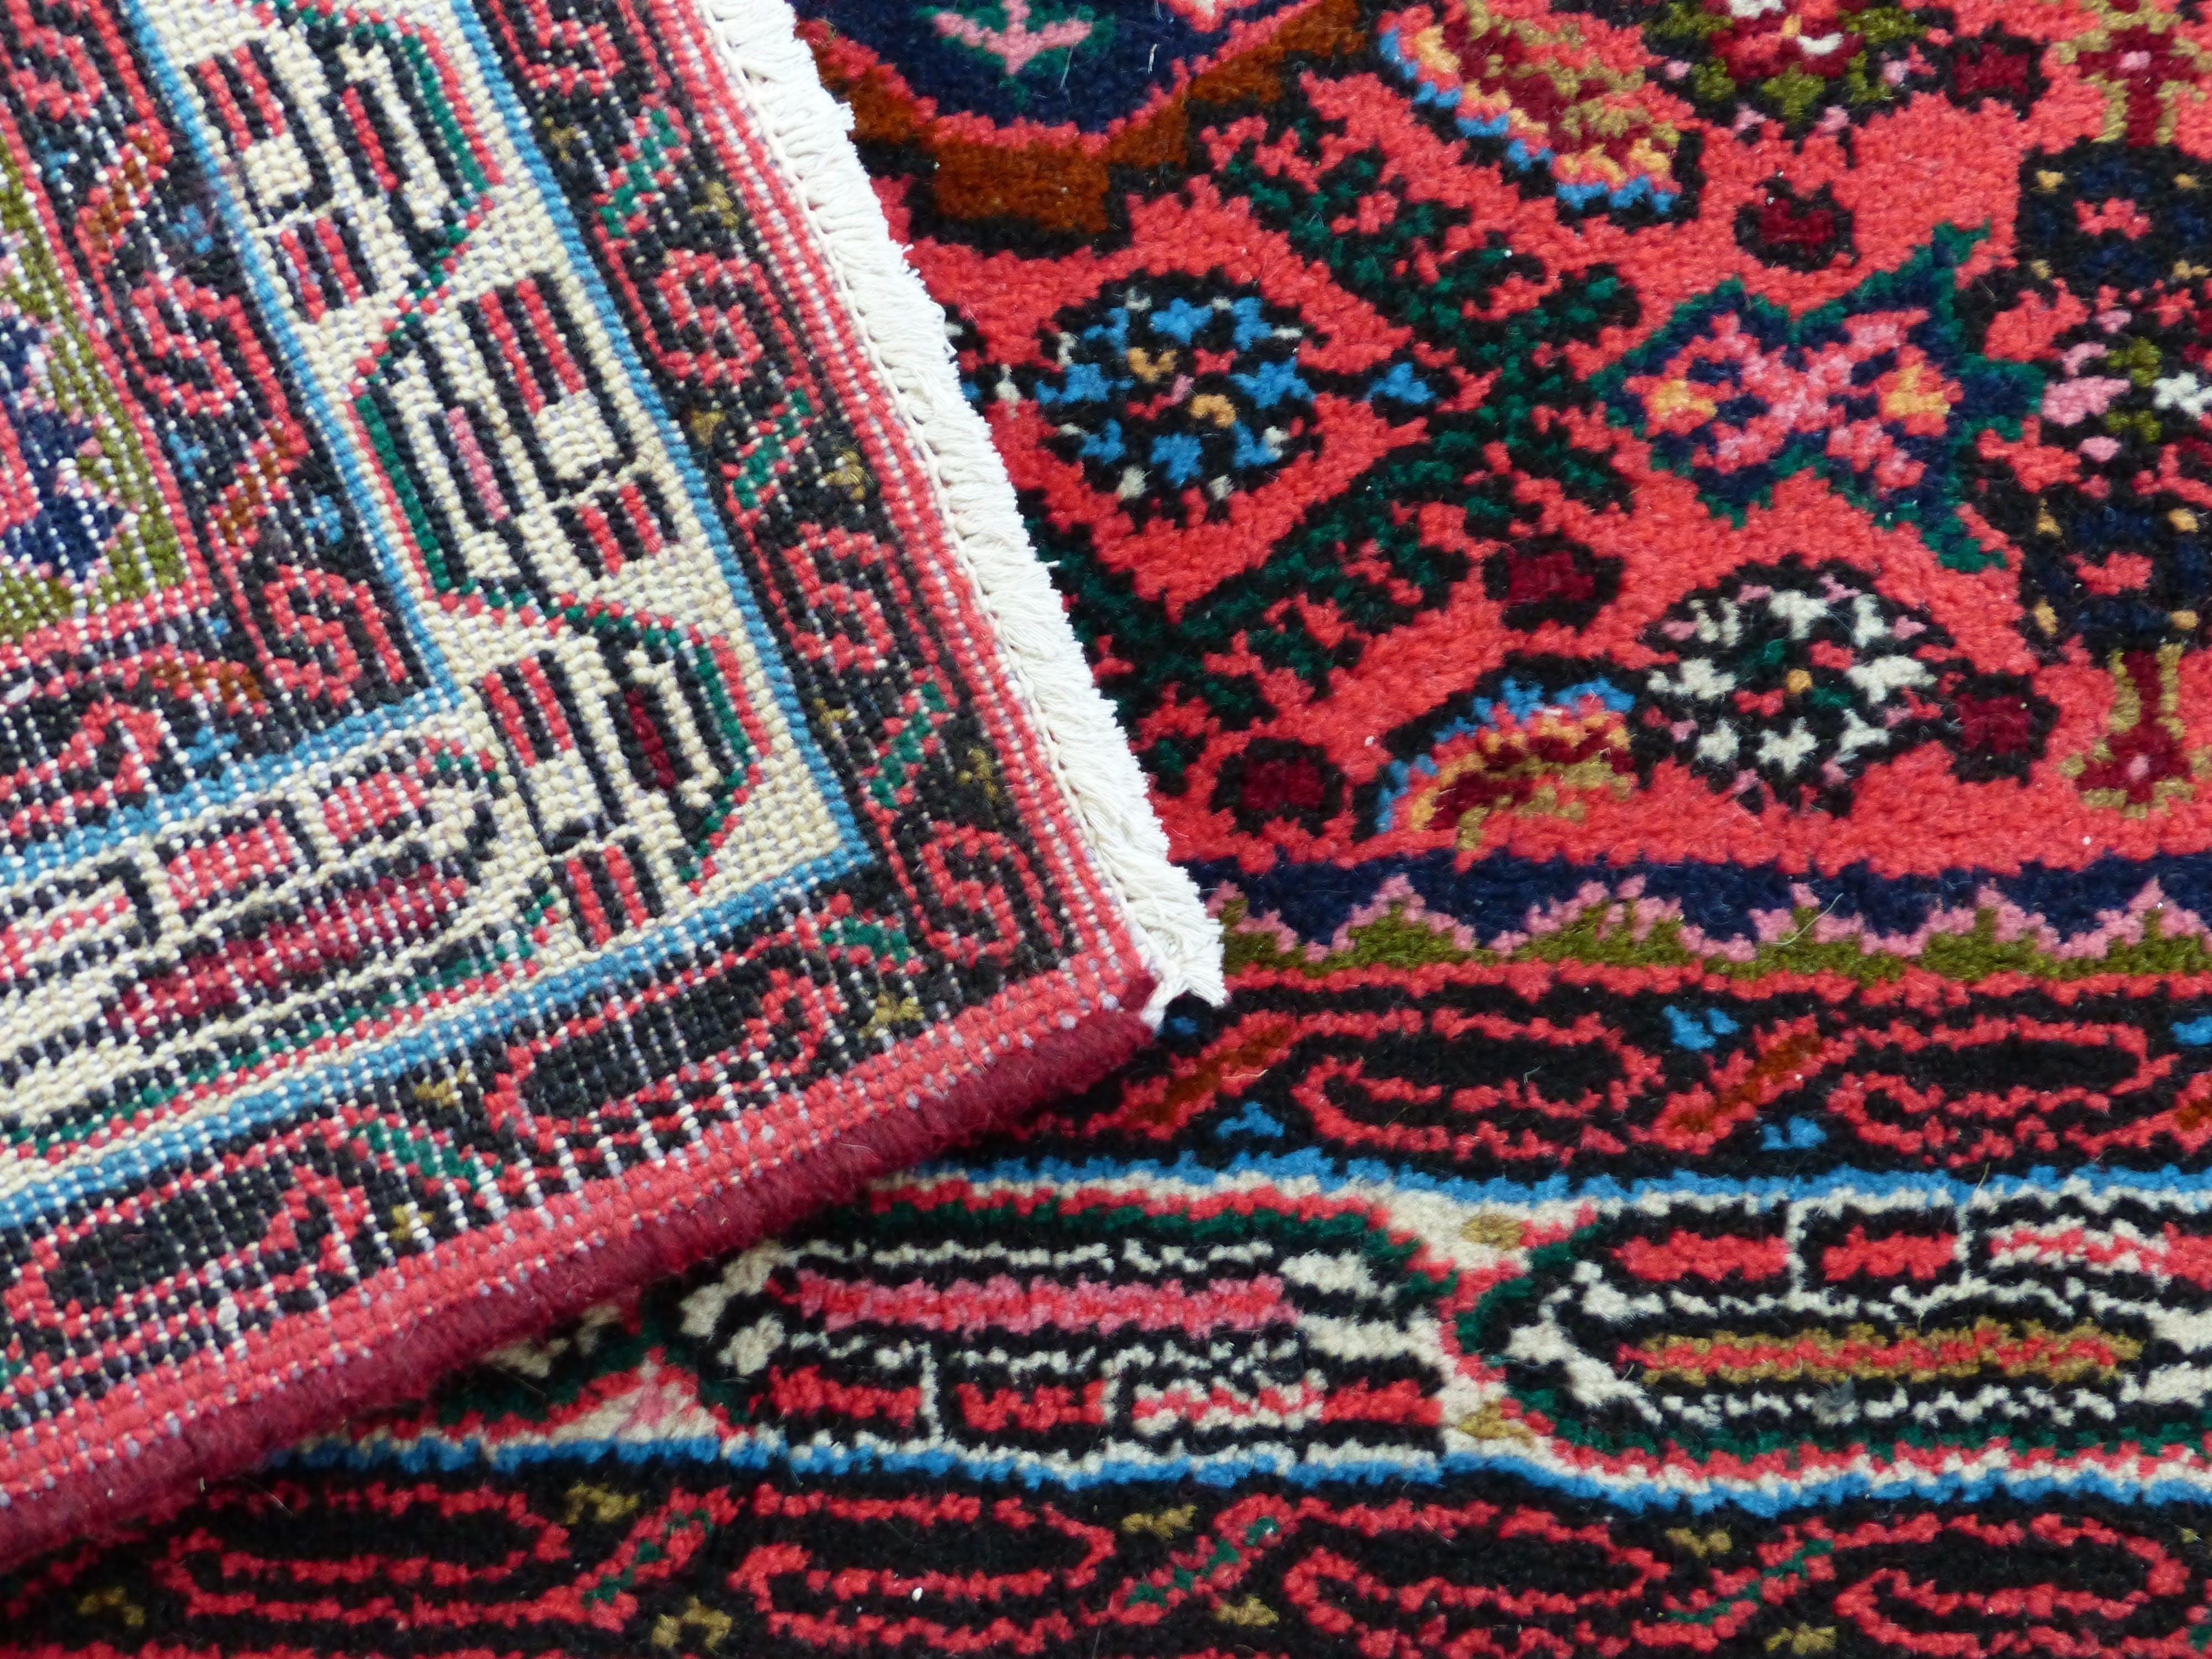 Free stock photo of art, carpet, carpet weaving center, color